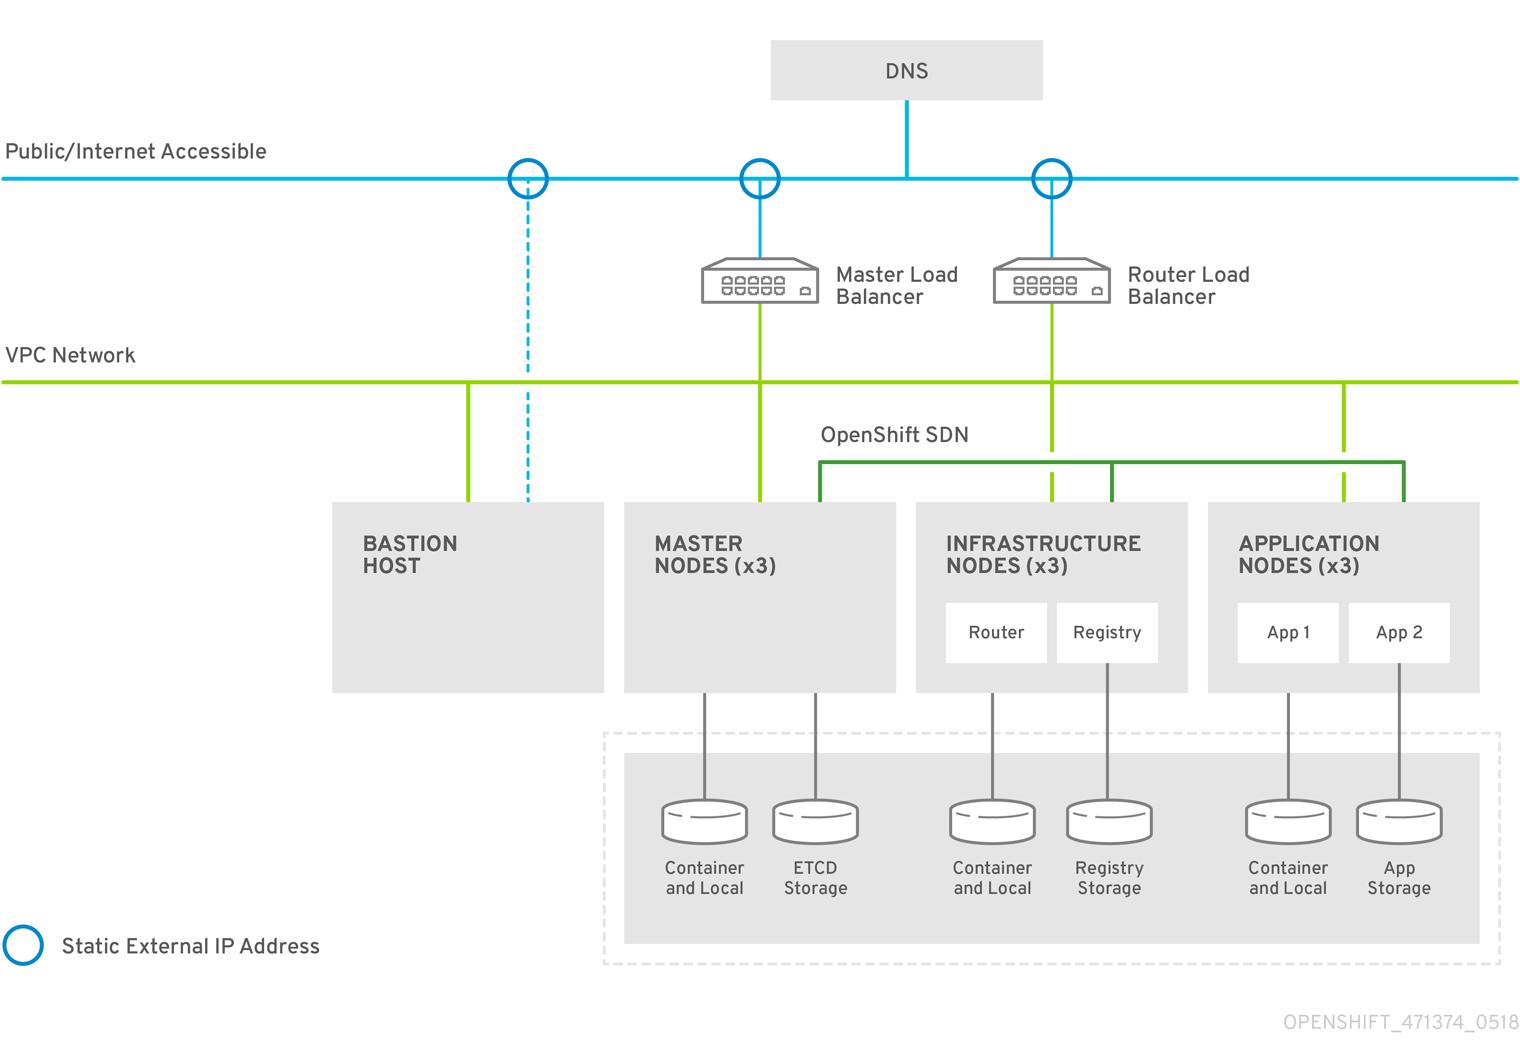 OpenShift ContainerPlatform GCP RA 471374 0518